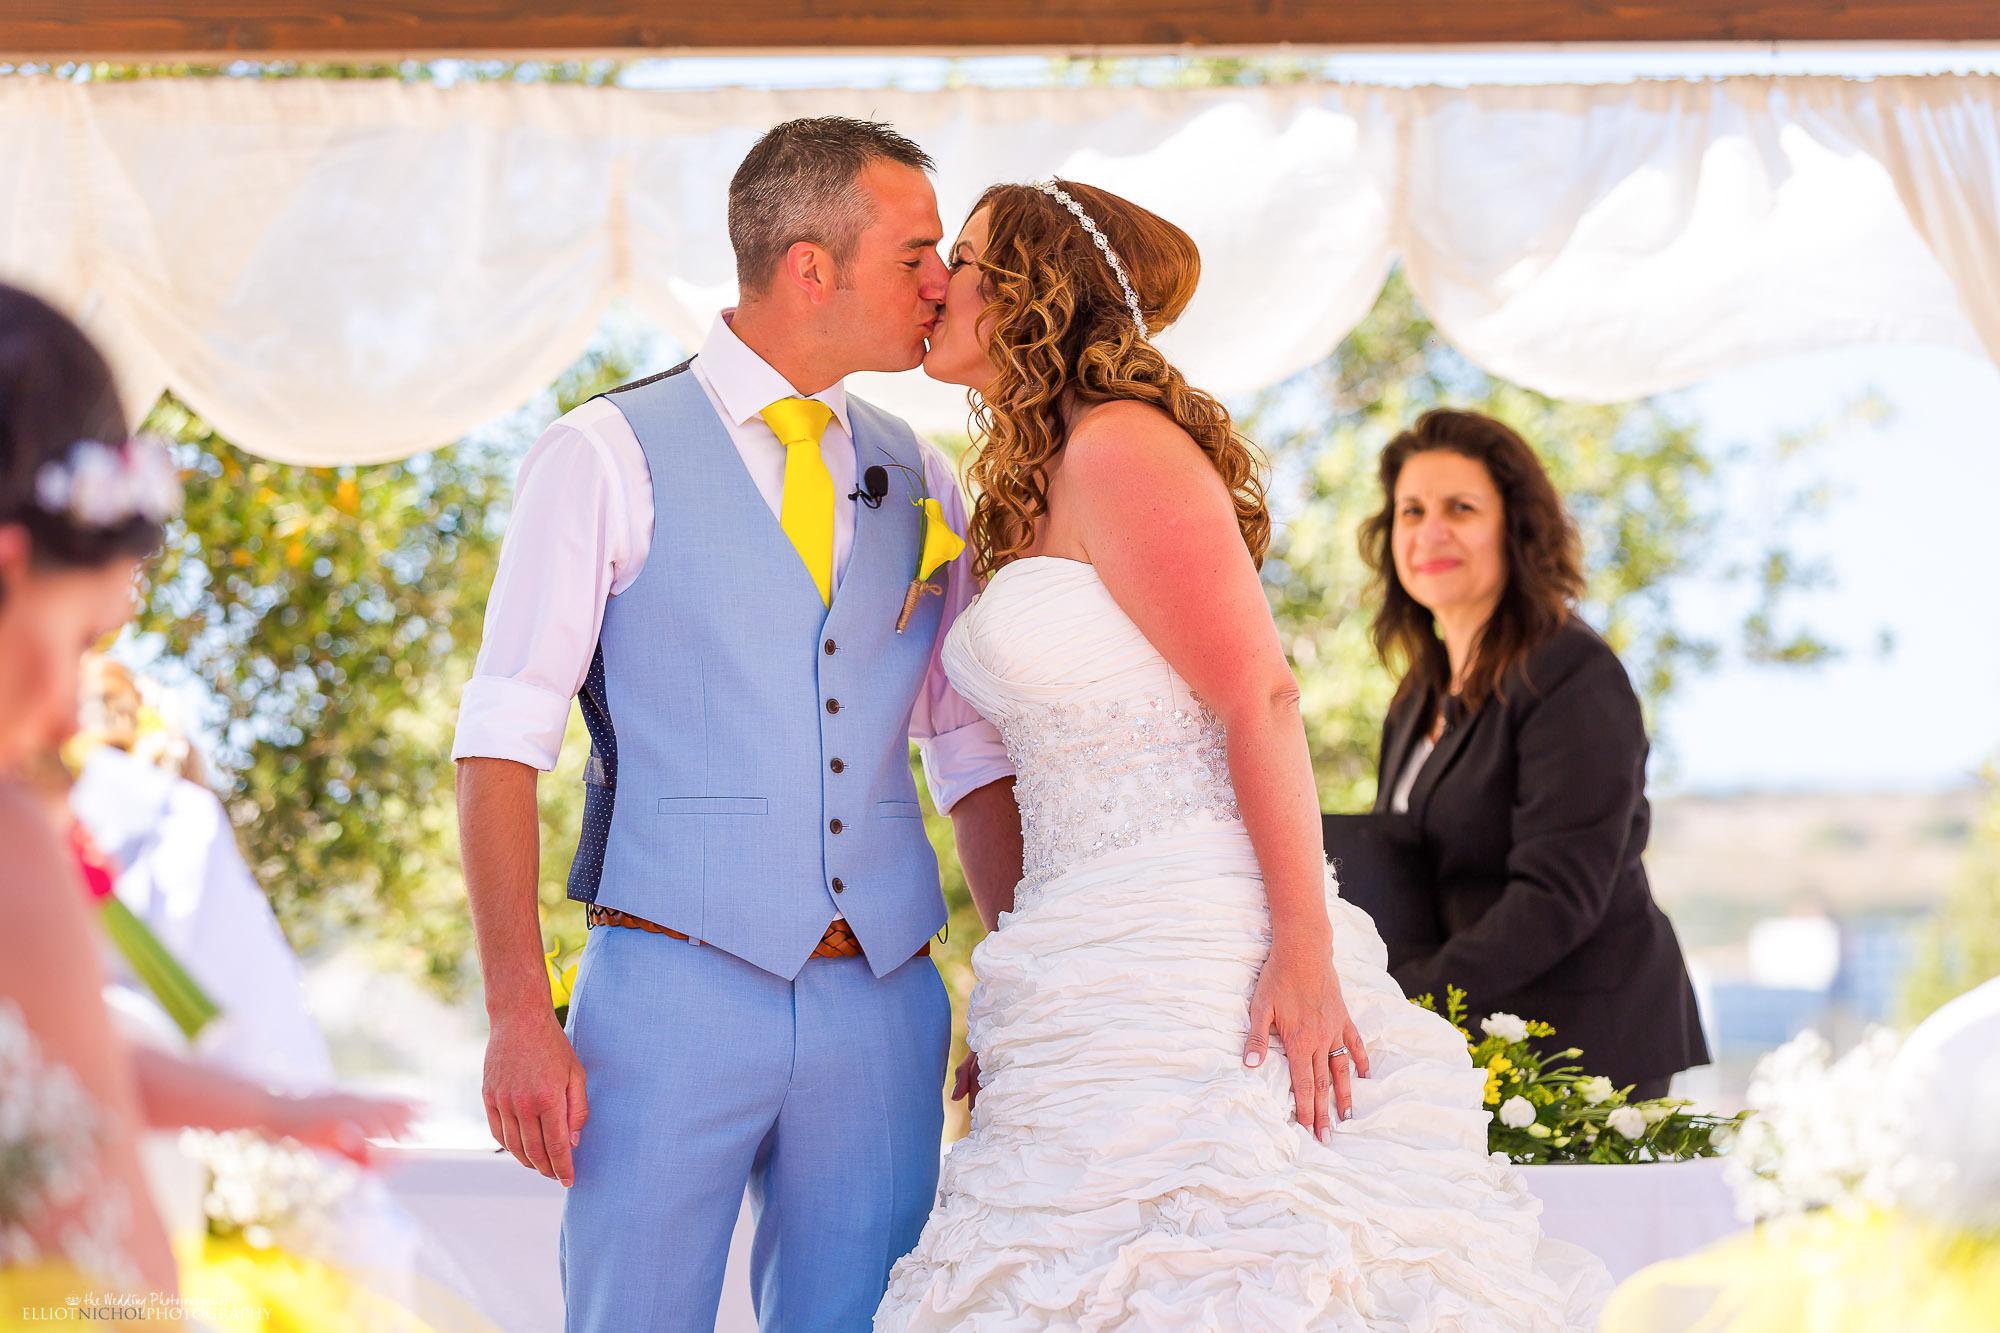 kiss-kissing-wedding-ceremony-newlyweds-photography